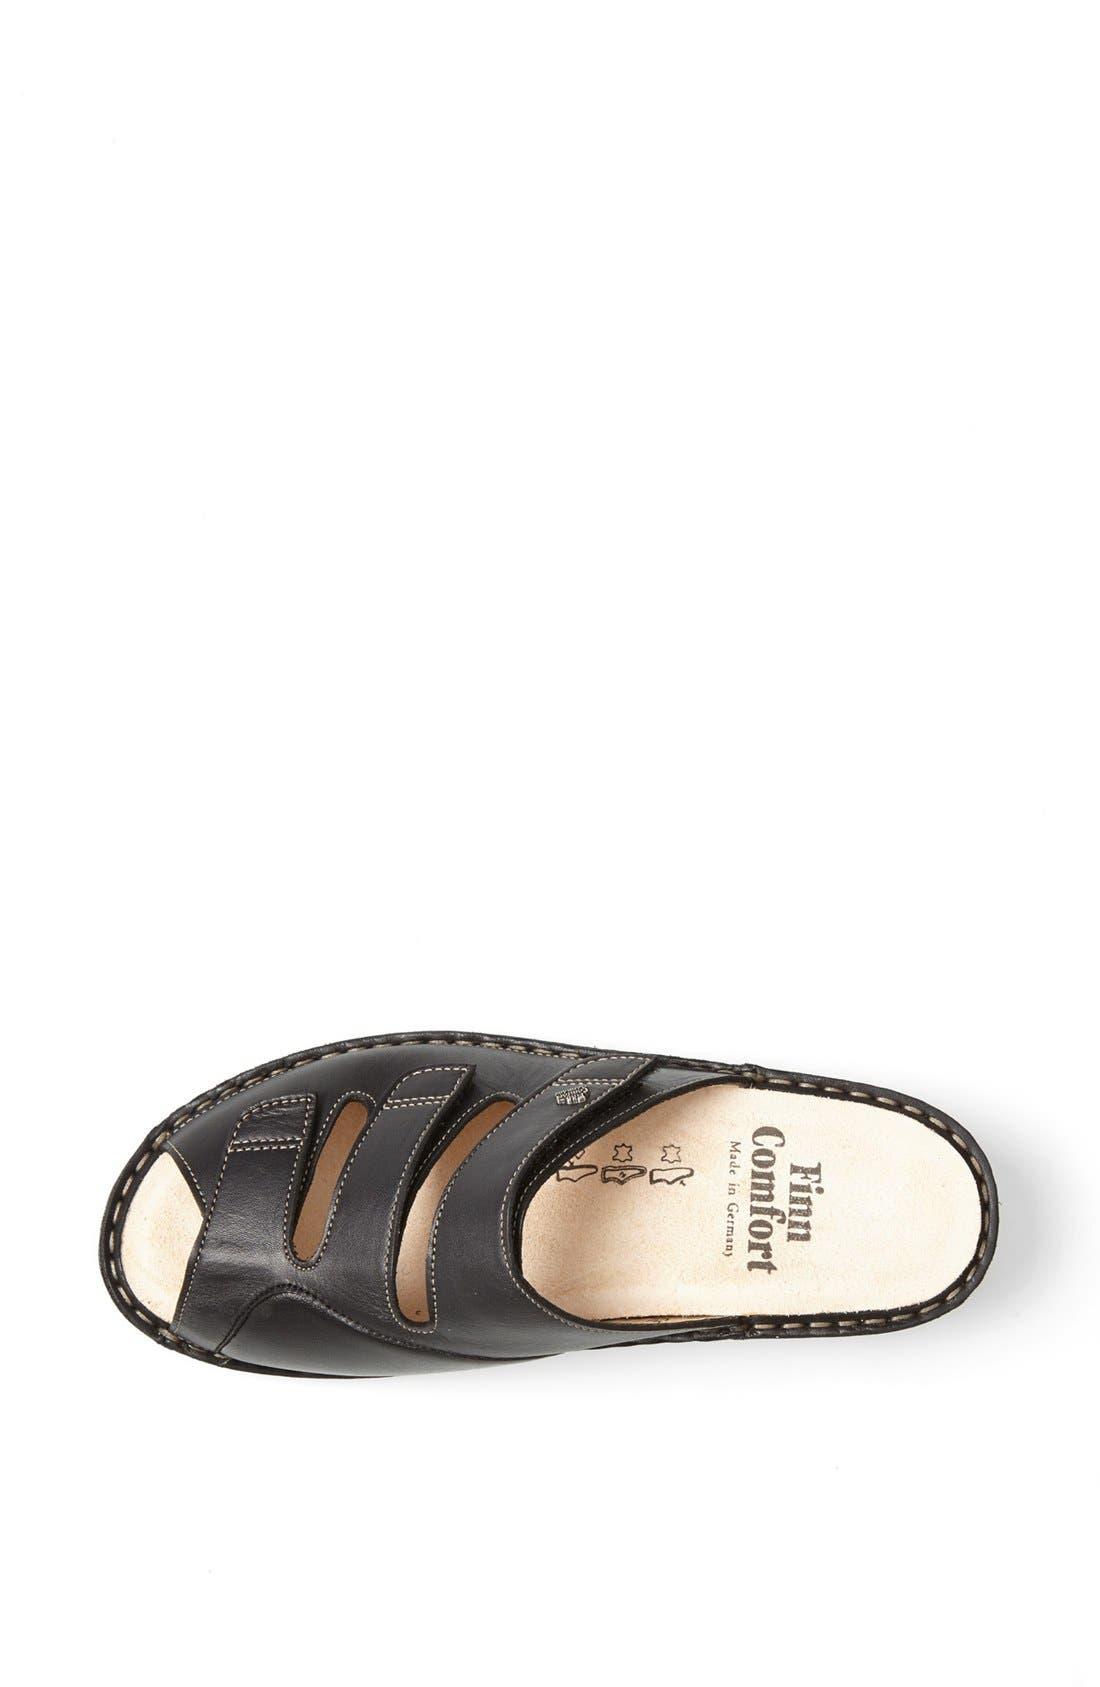 'Tilburg' Leather Sandal,                             Alternate thumbnail 3, color,                             Black